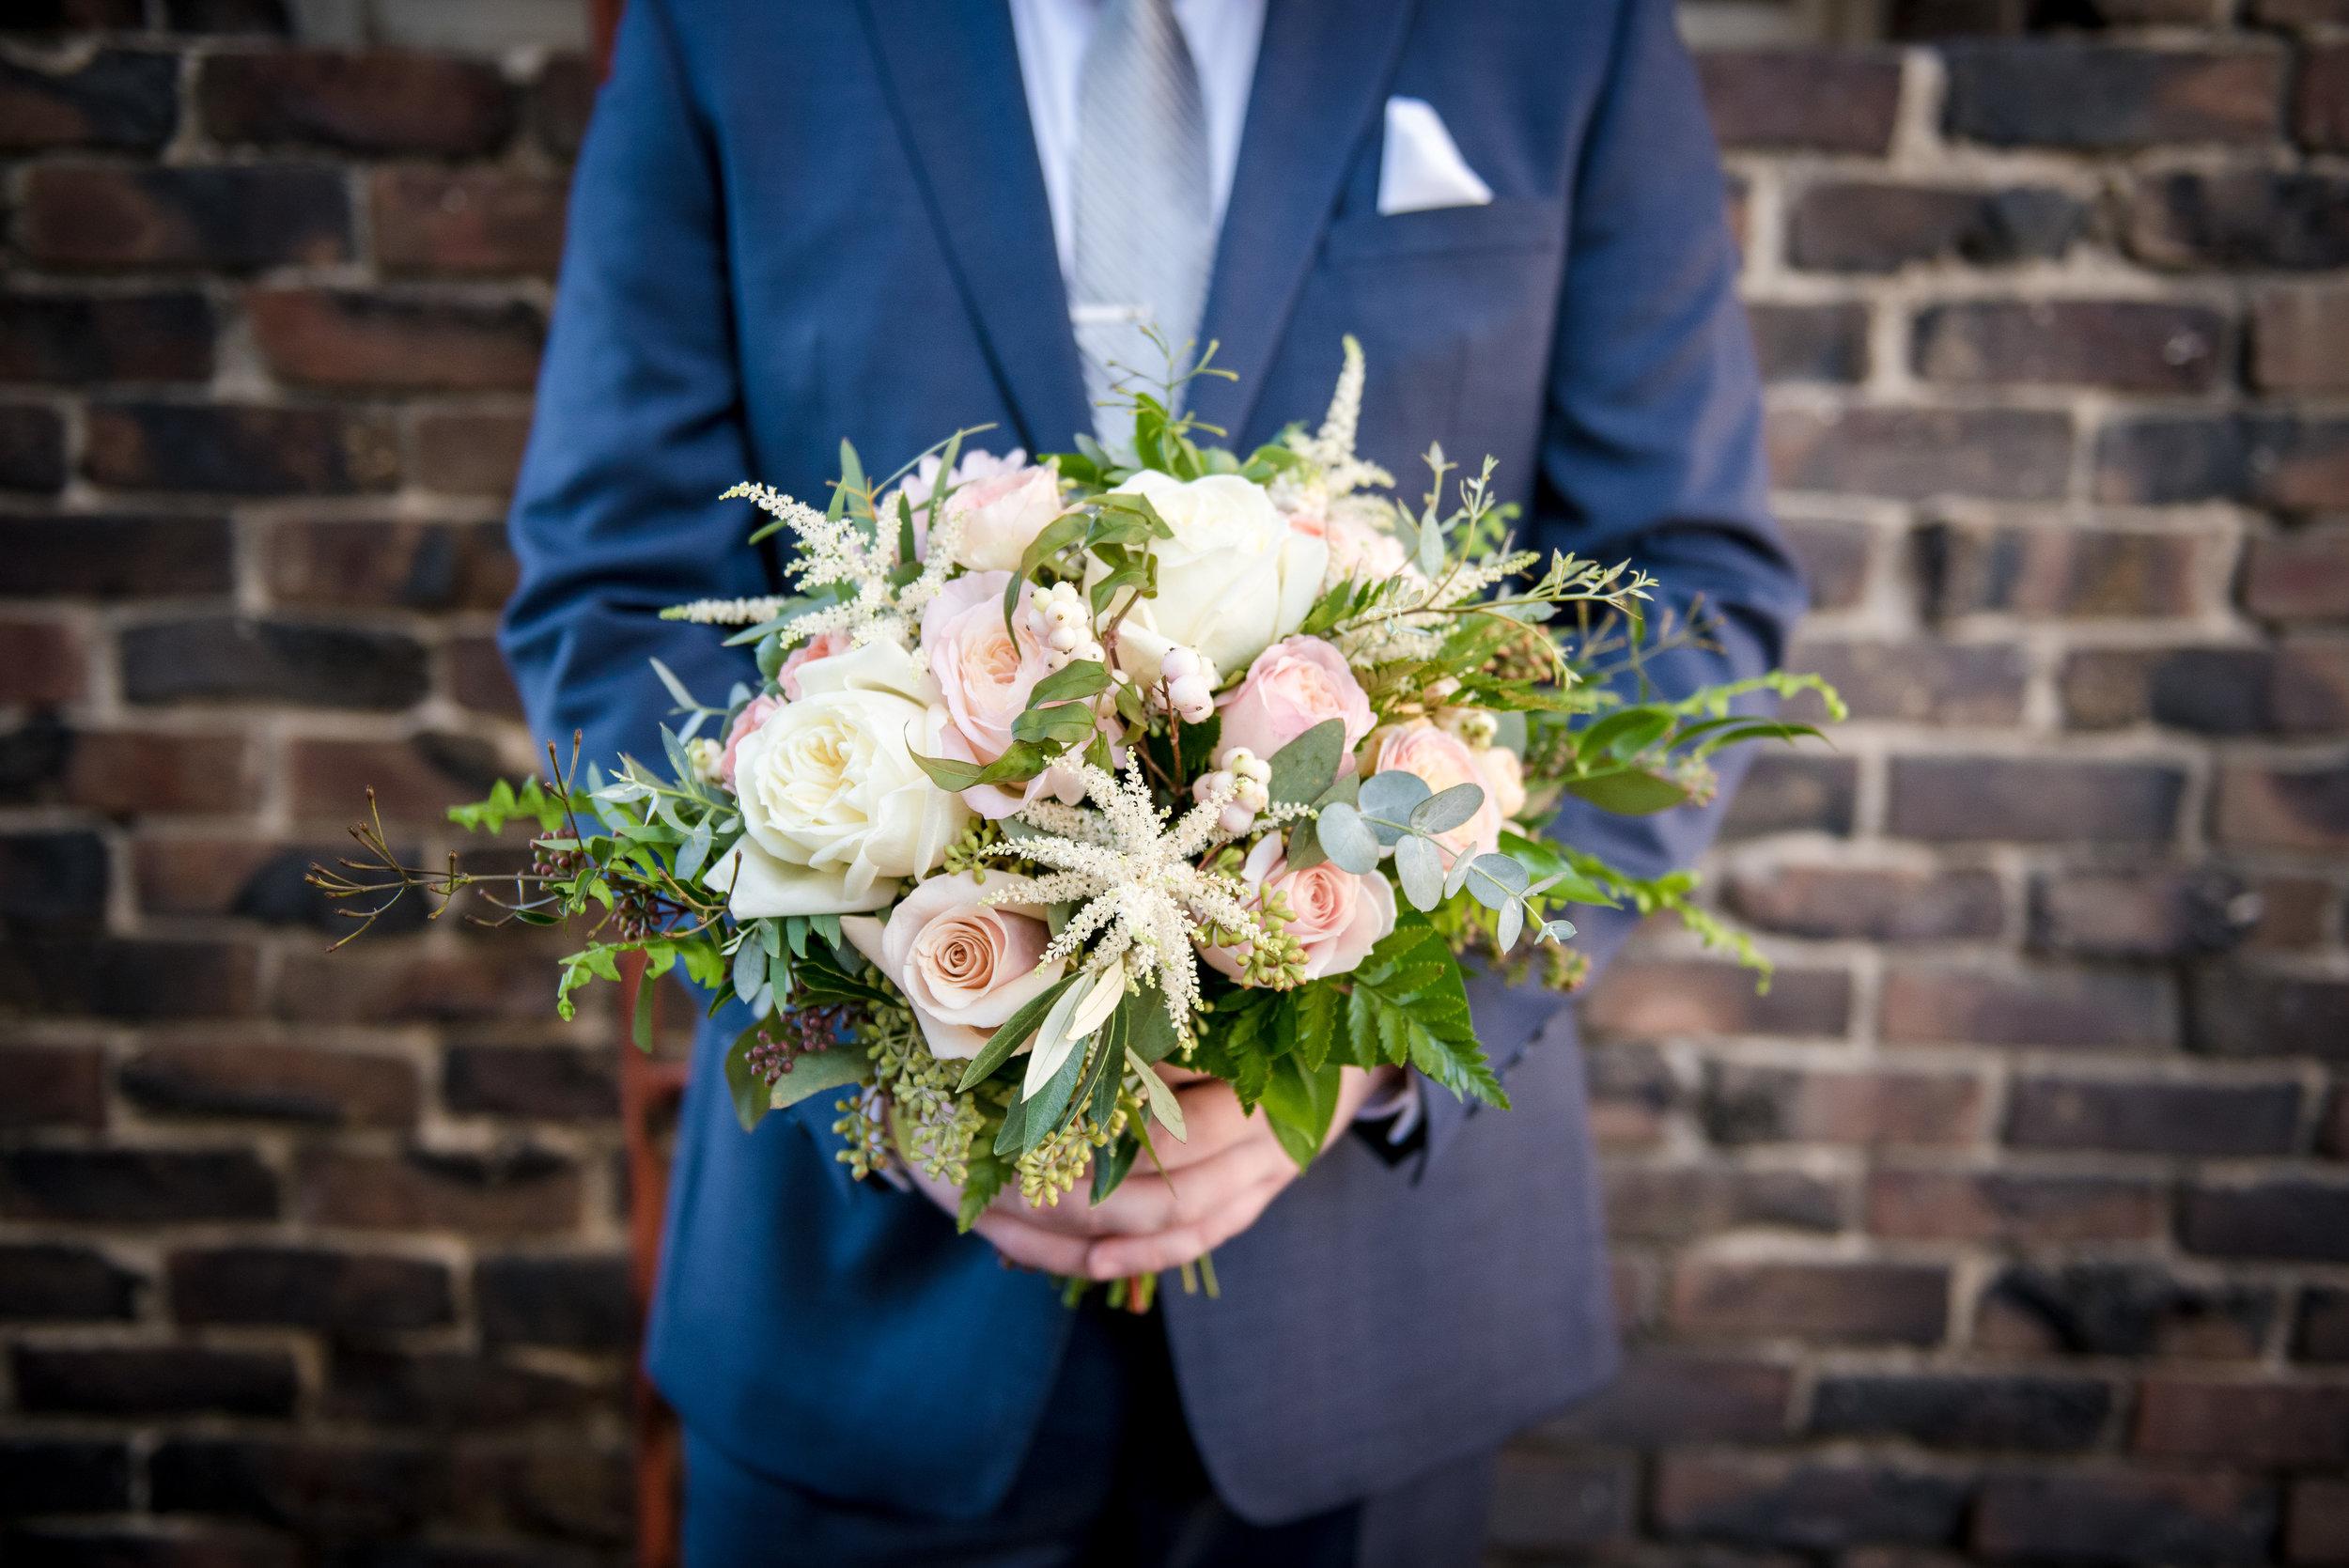 Bridal_Bouquet_Garden_Roses_Greens_Vizcaya_Sacramento_Violette_Fleurs.jpg